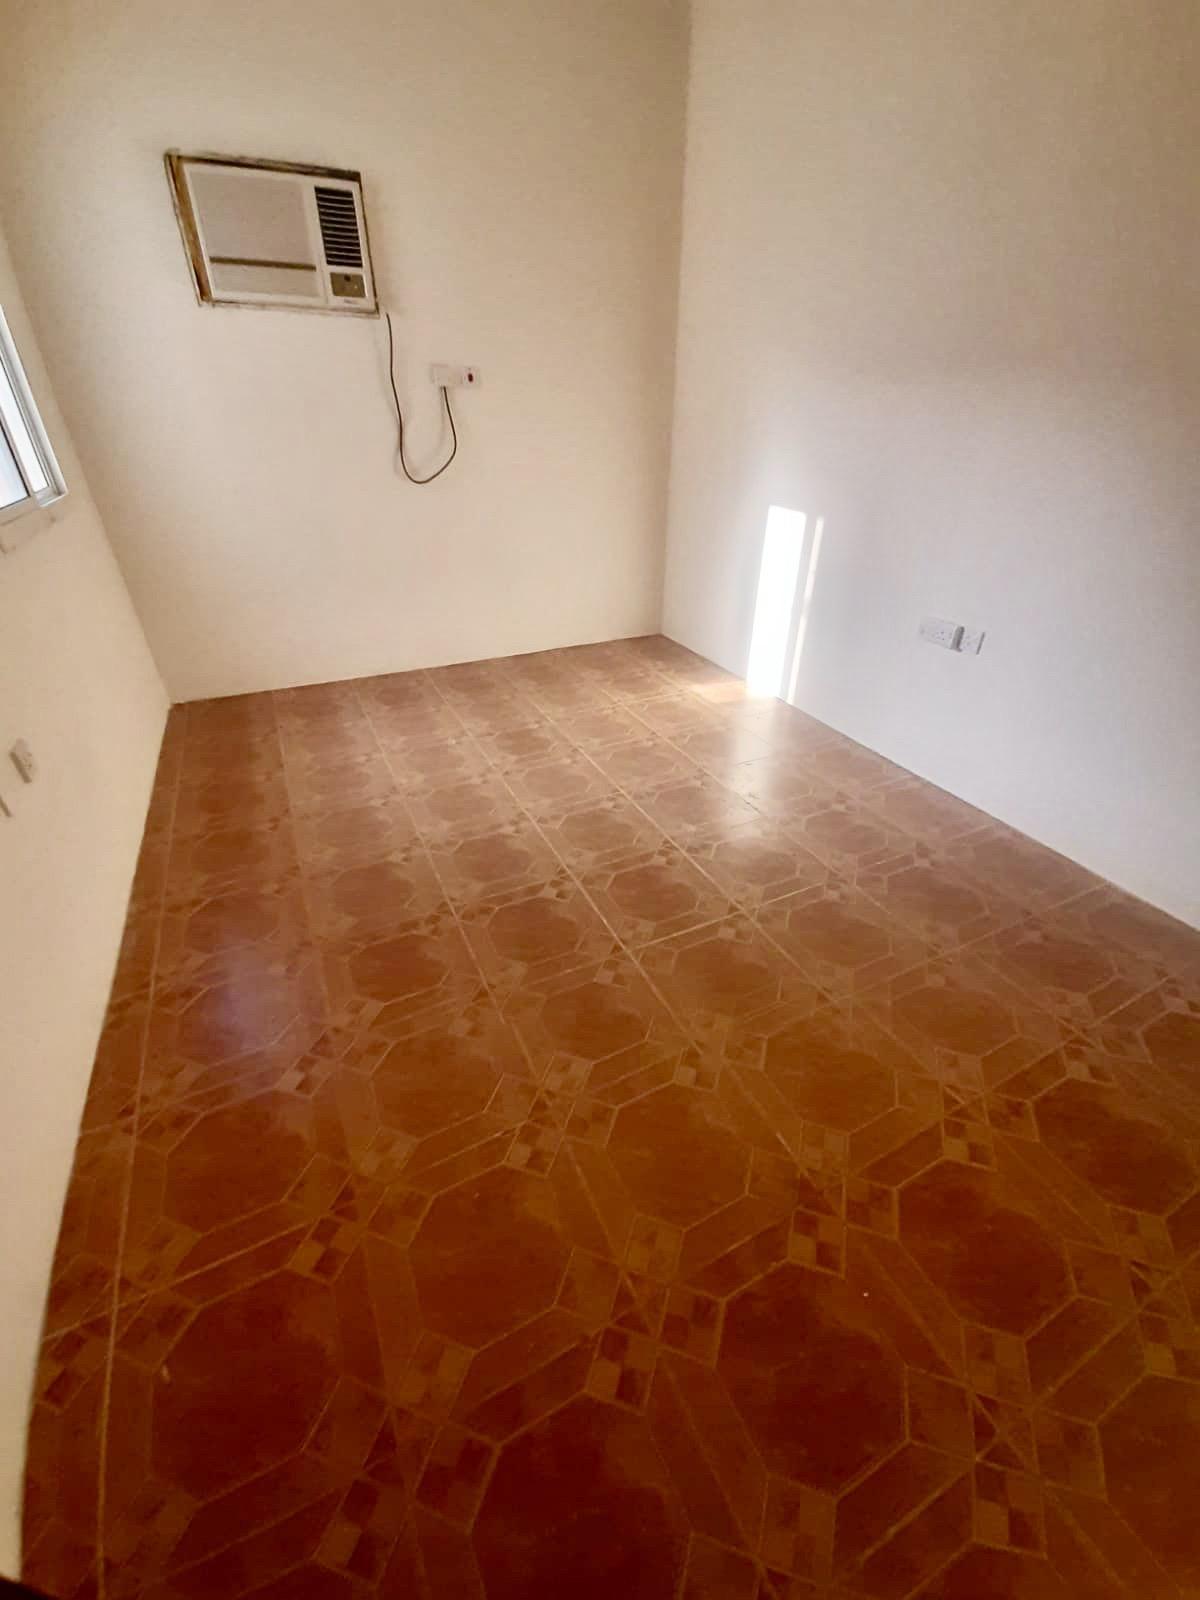 2 BEDROOM FLAT AVAILABLE IN AL SADD NEAR CENTERPOI